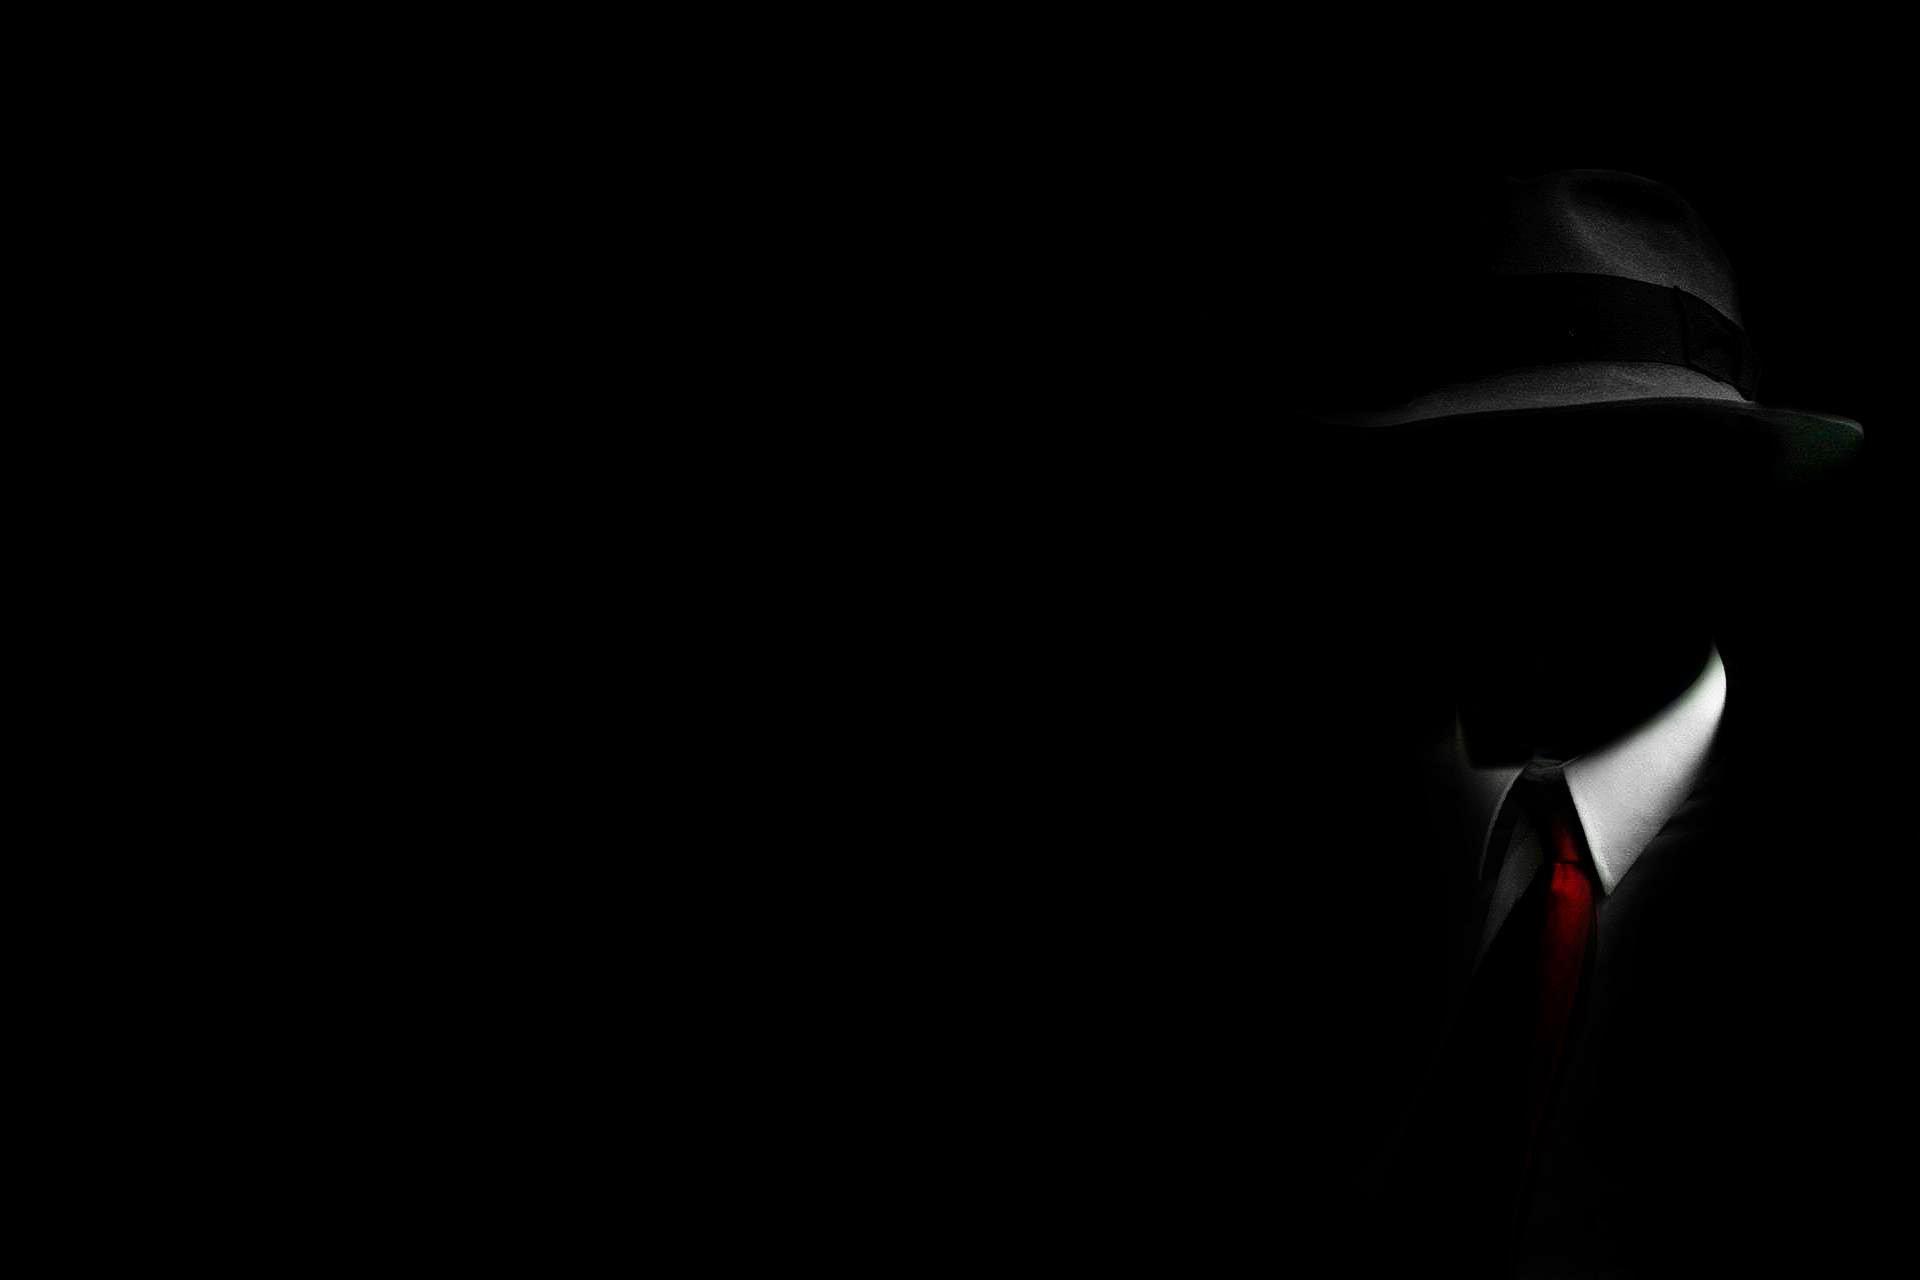 black hat hackers wallpaper - photo #15